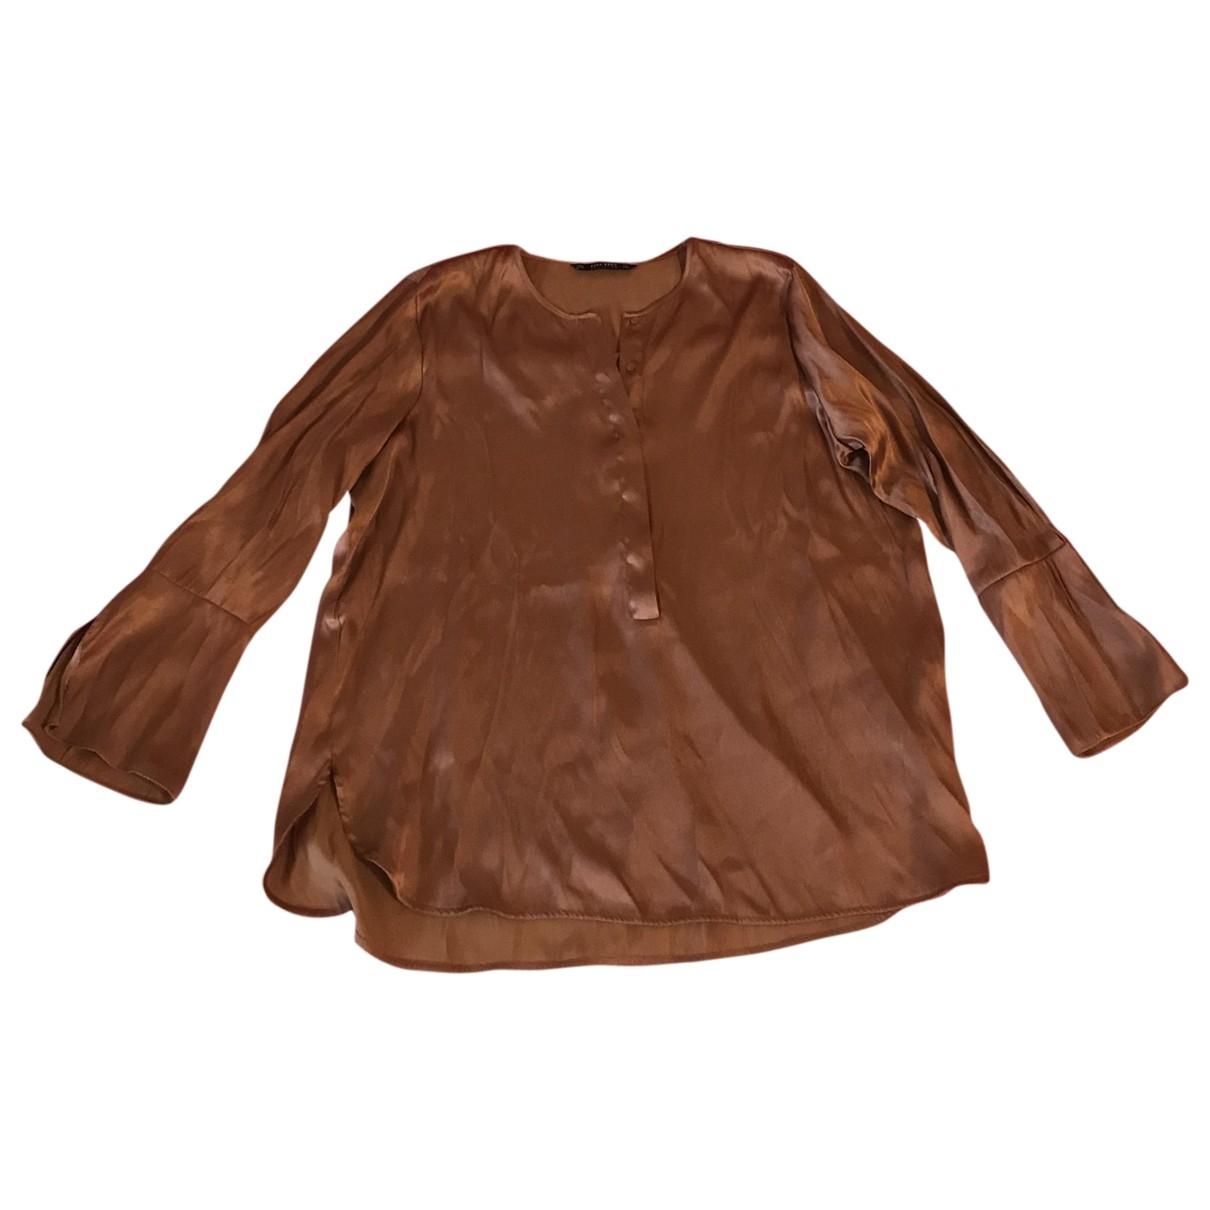 Zara \N Brown  top for Women XL International